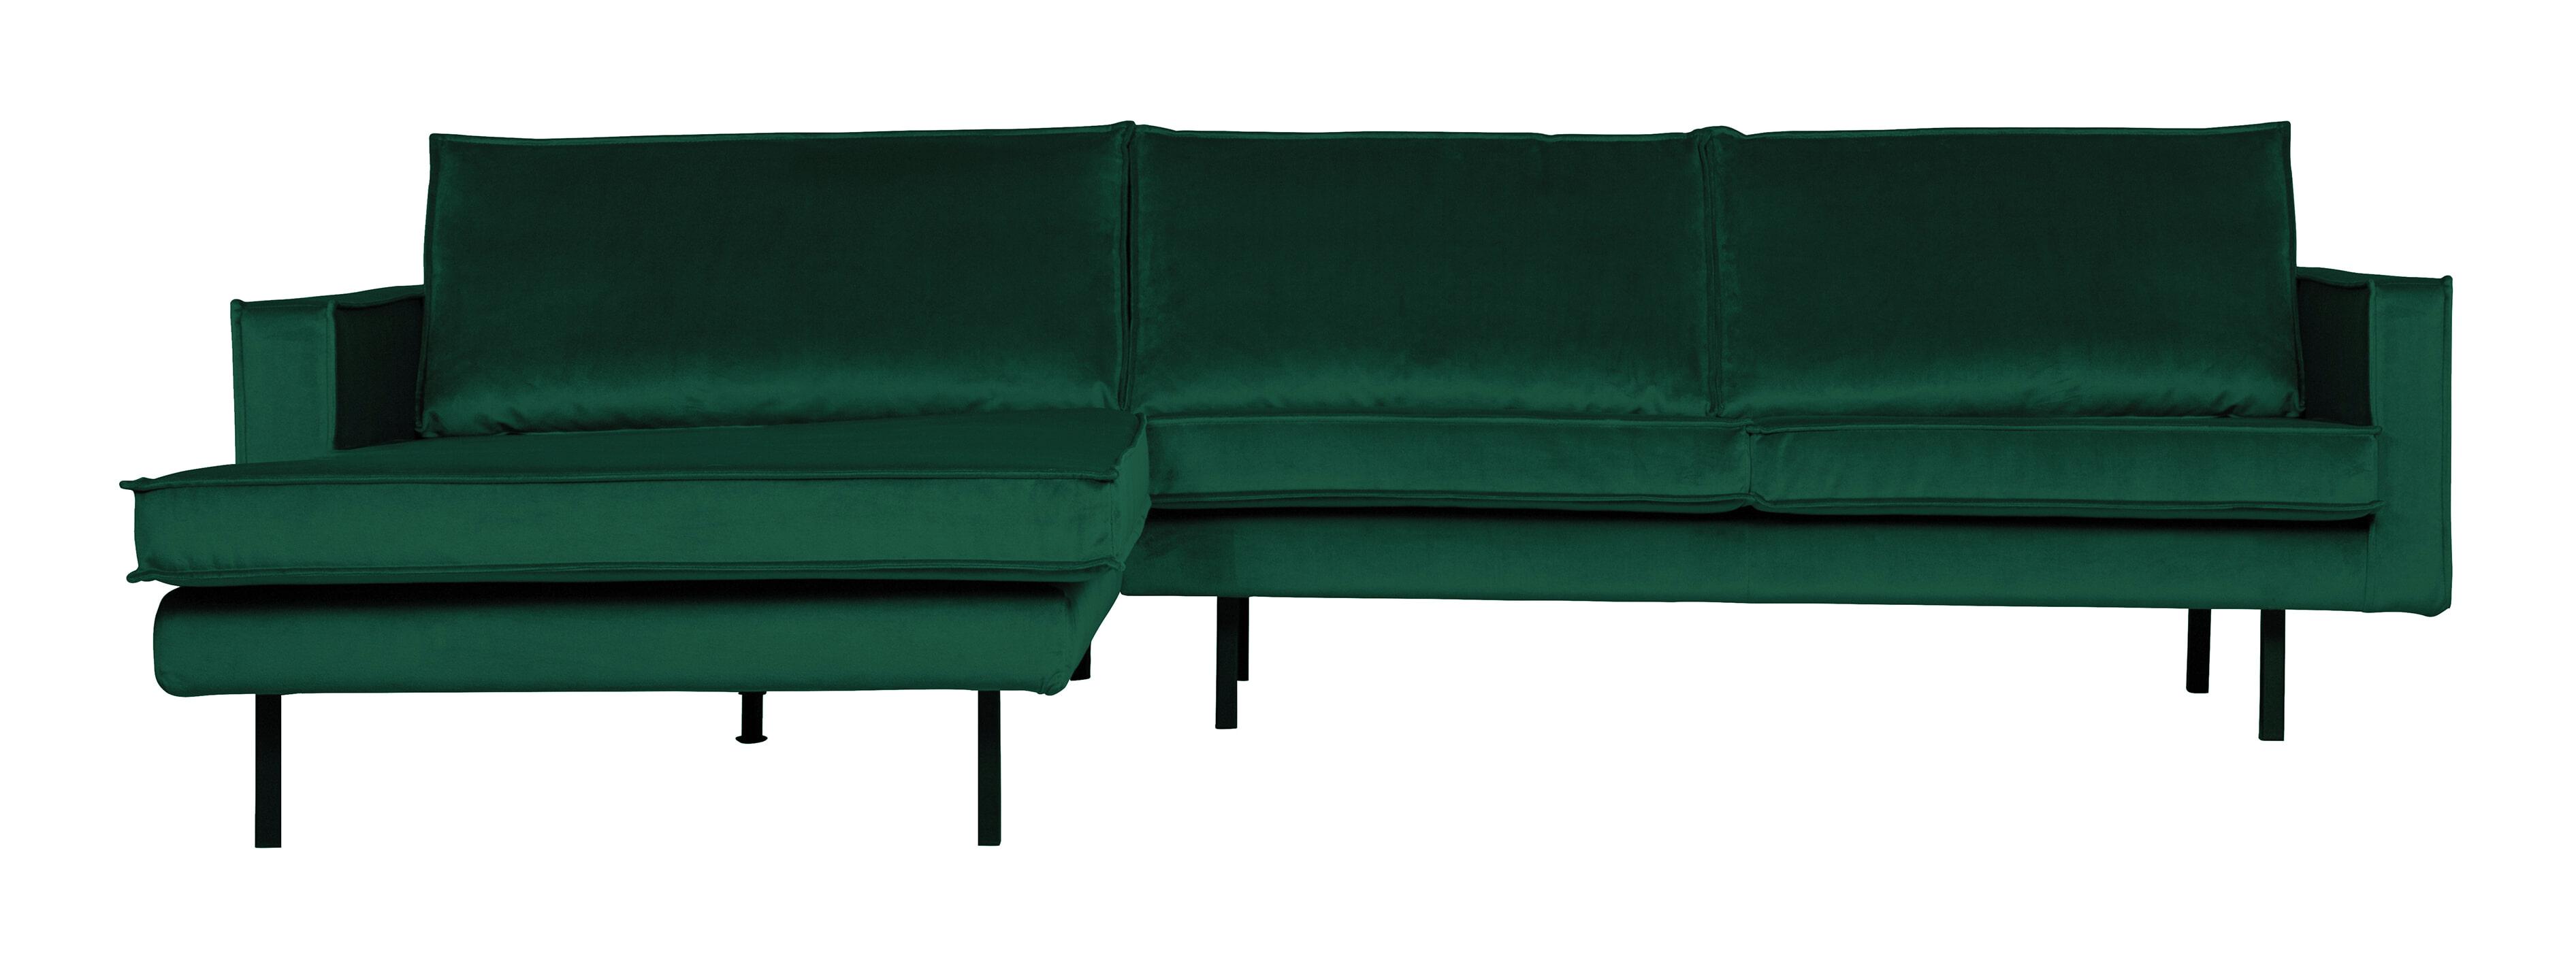 BePureHome Loungebank 'Rodeo' Links, Velvet, kleur Green Forest